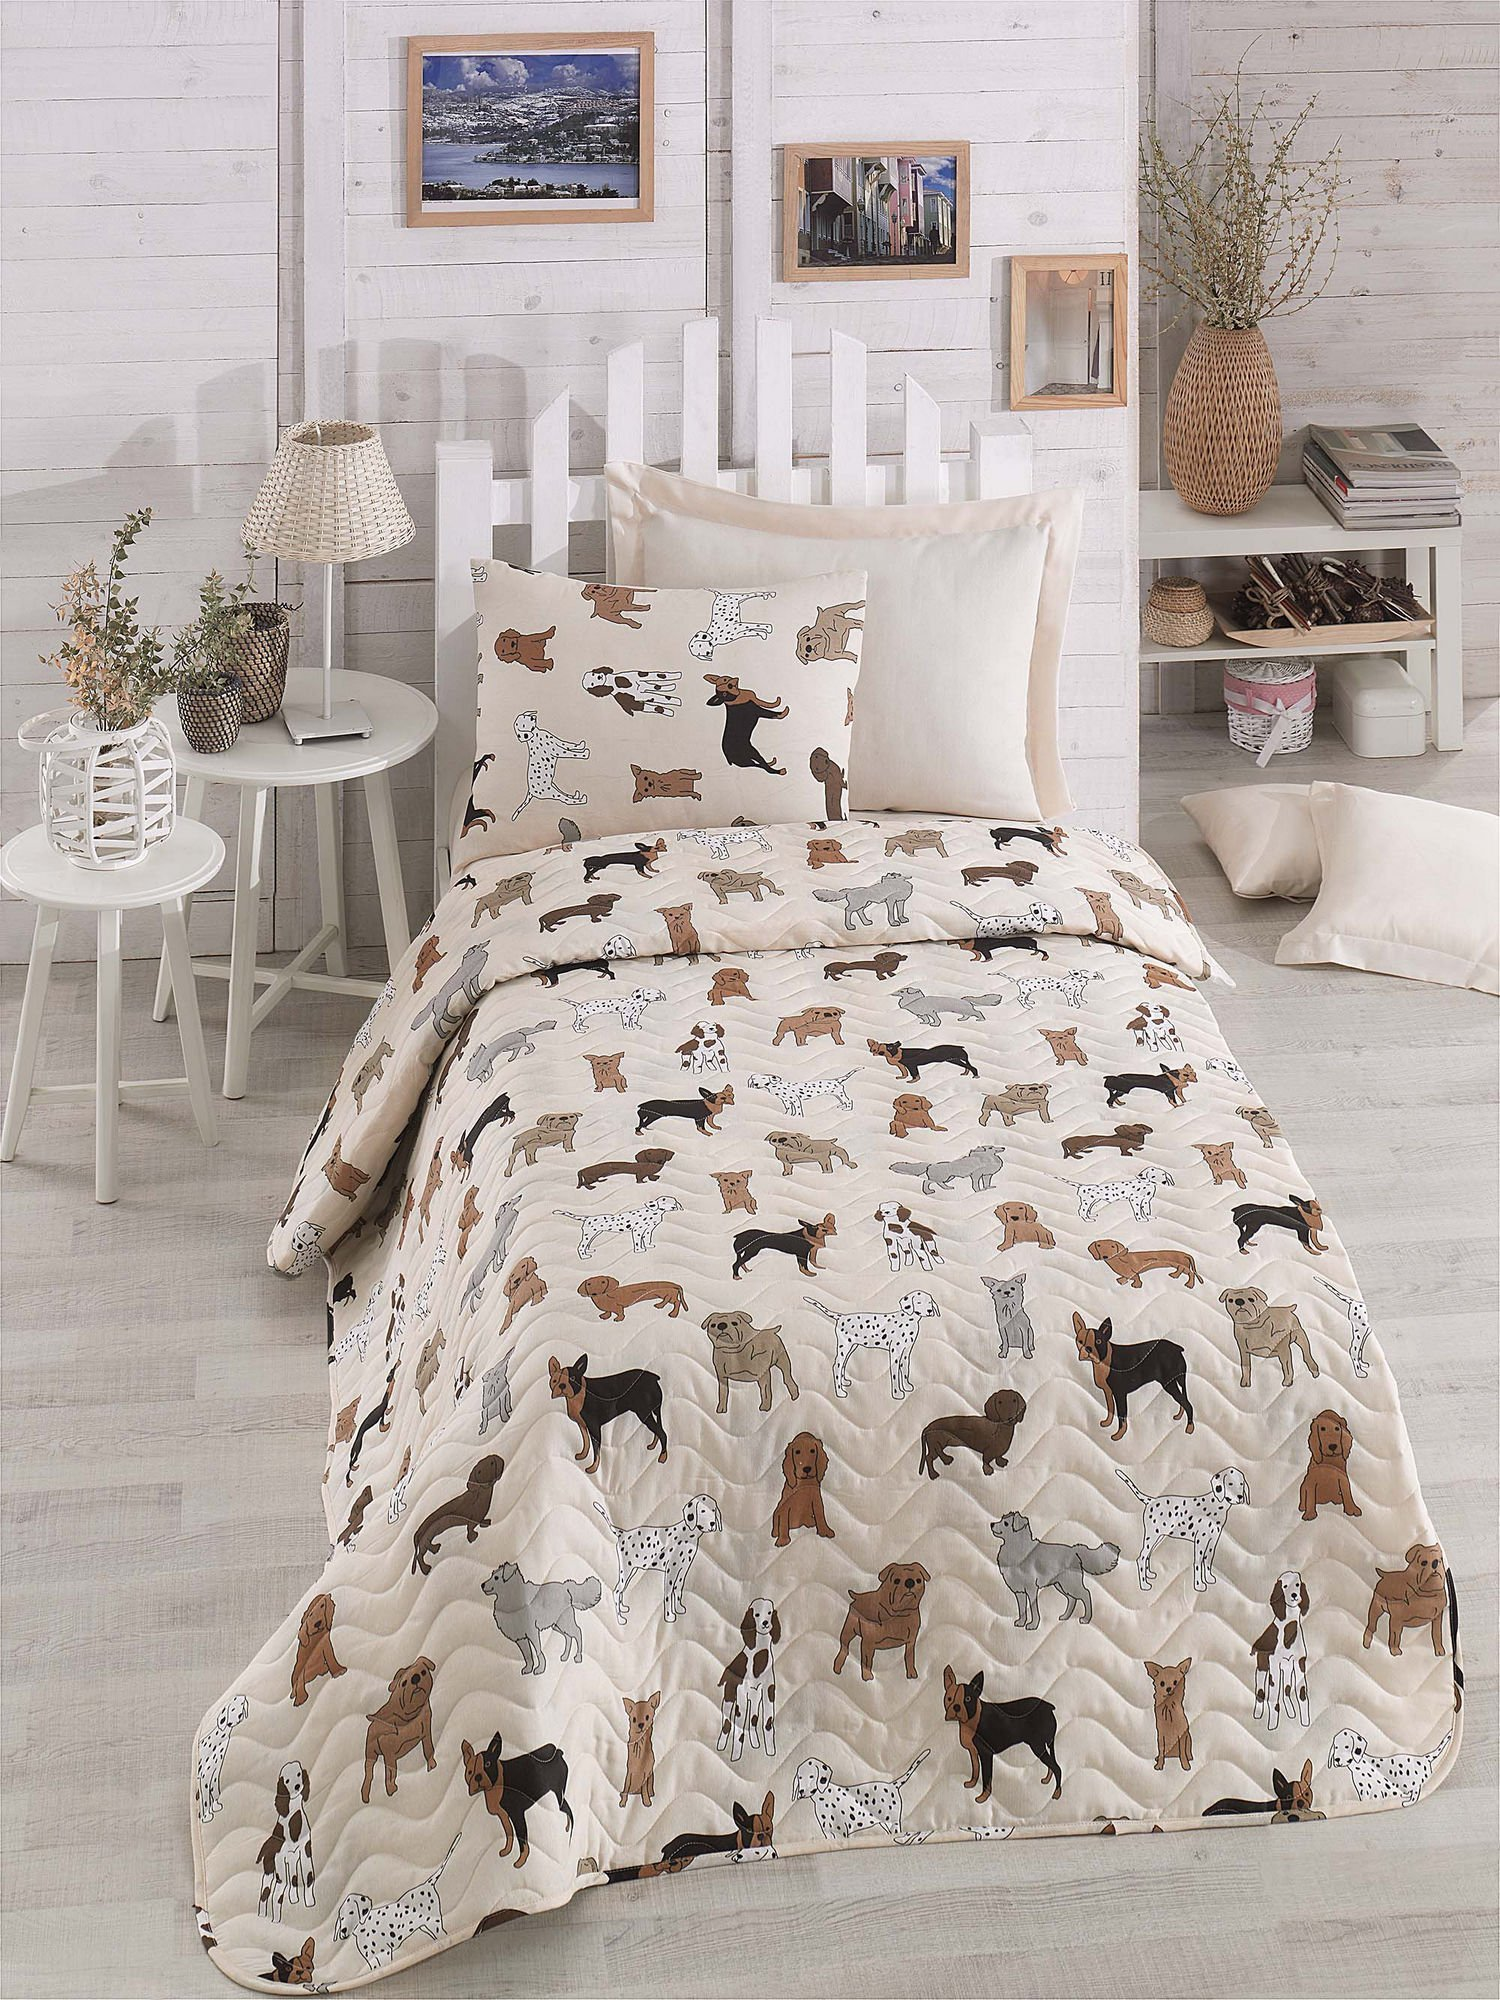 LaModaHome Puppy Bedding Set, 65% Cotton 35% Polyester - Various Dog Breeds, Bulldog, Dalmatian - Set of 2-100% Fiber Filling Coverlet and Pillowcase for Single Bed